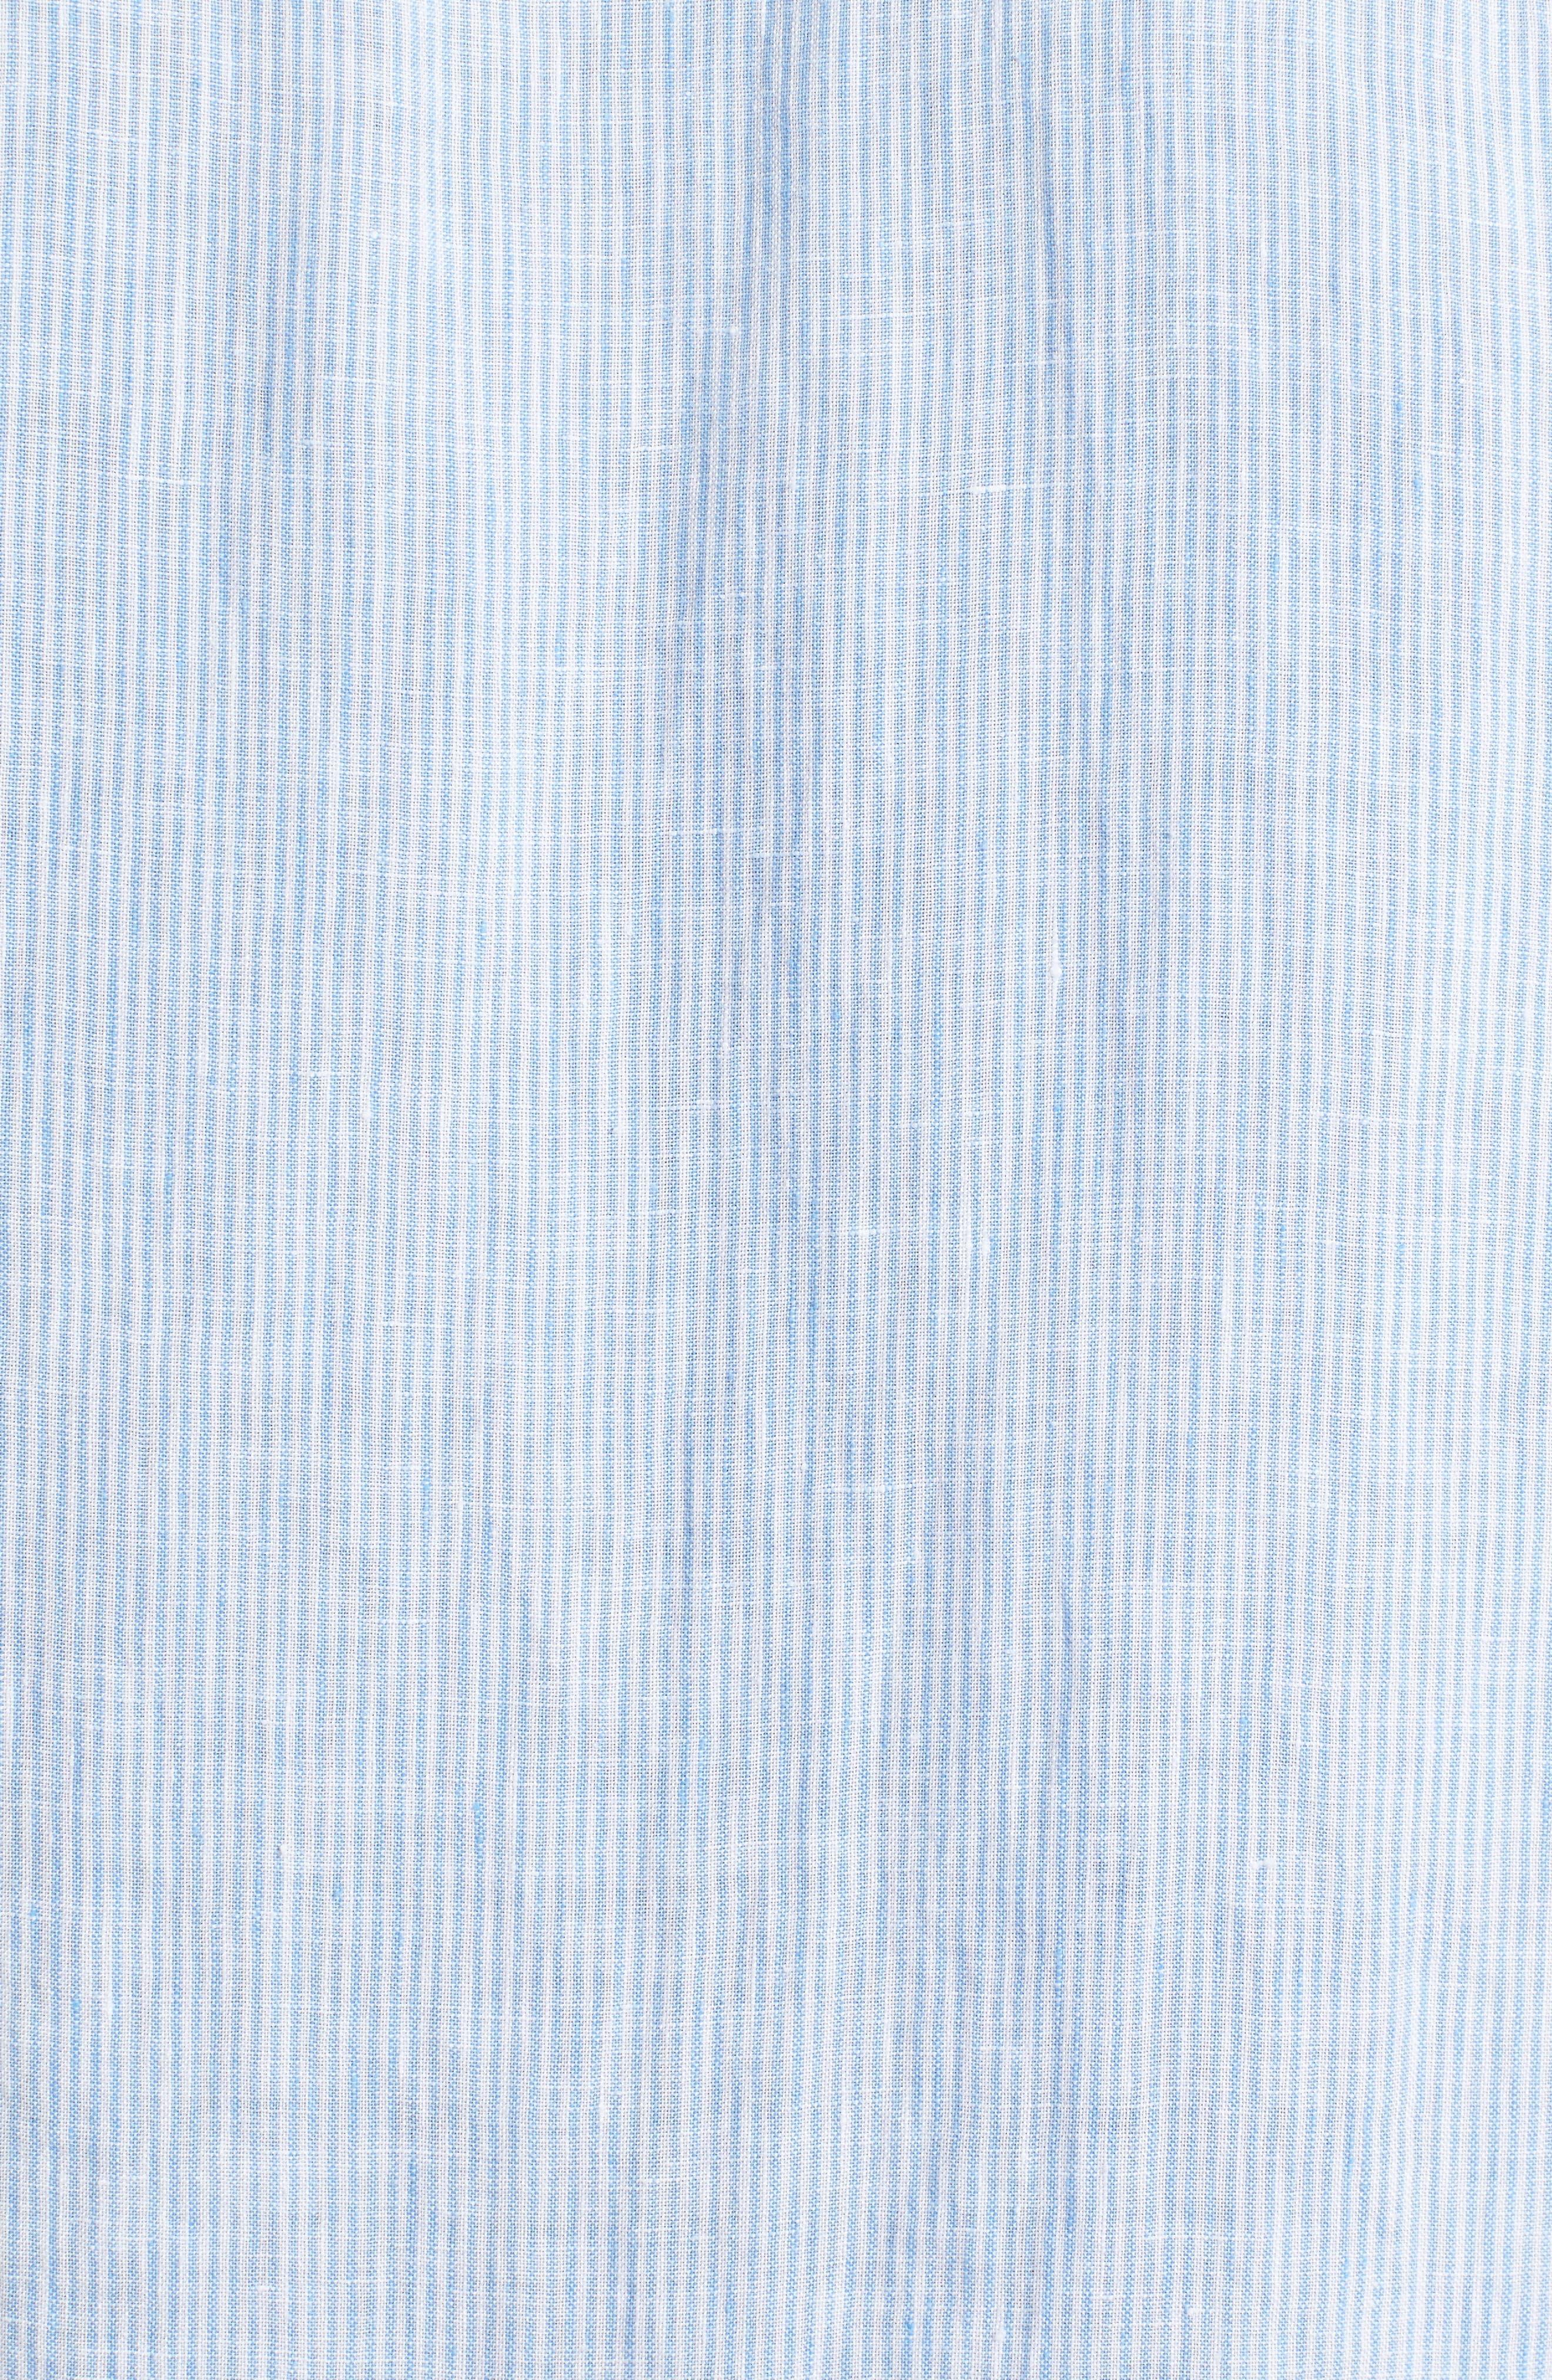 Trim Fit Microstripe Linen Shirt,                             Alternate thumbnail 4, color,